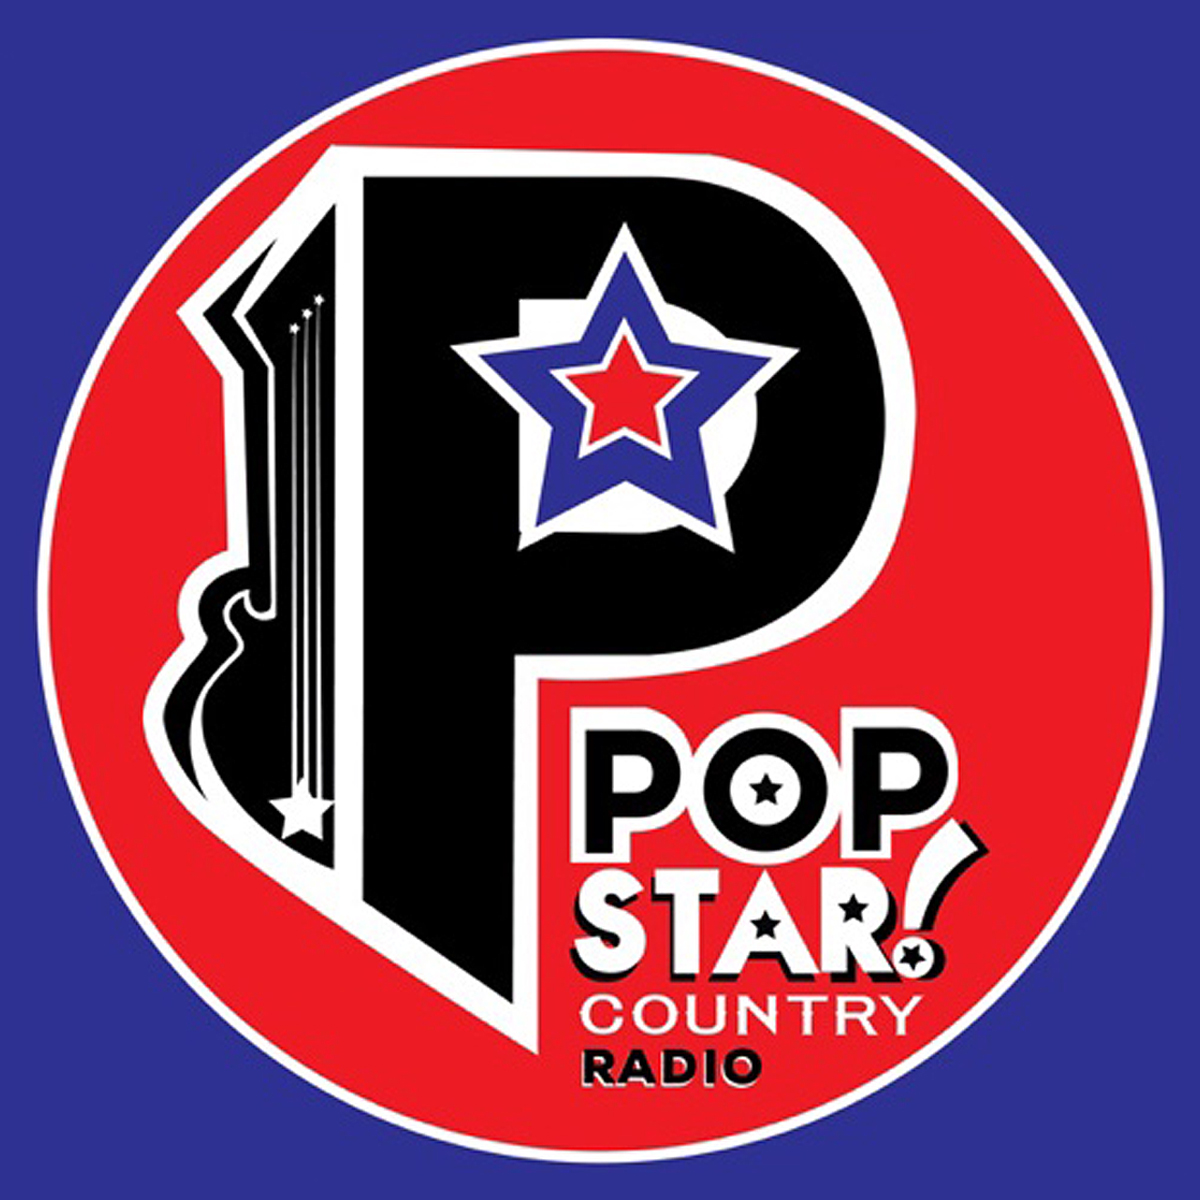 Popstar! Country Radio logo